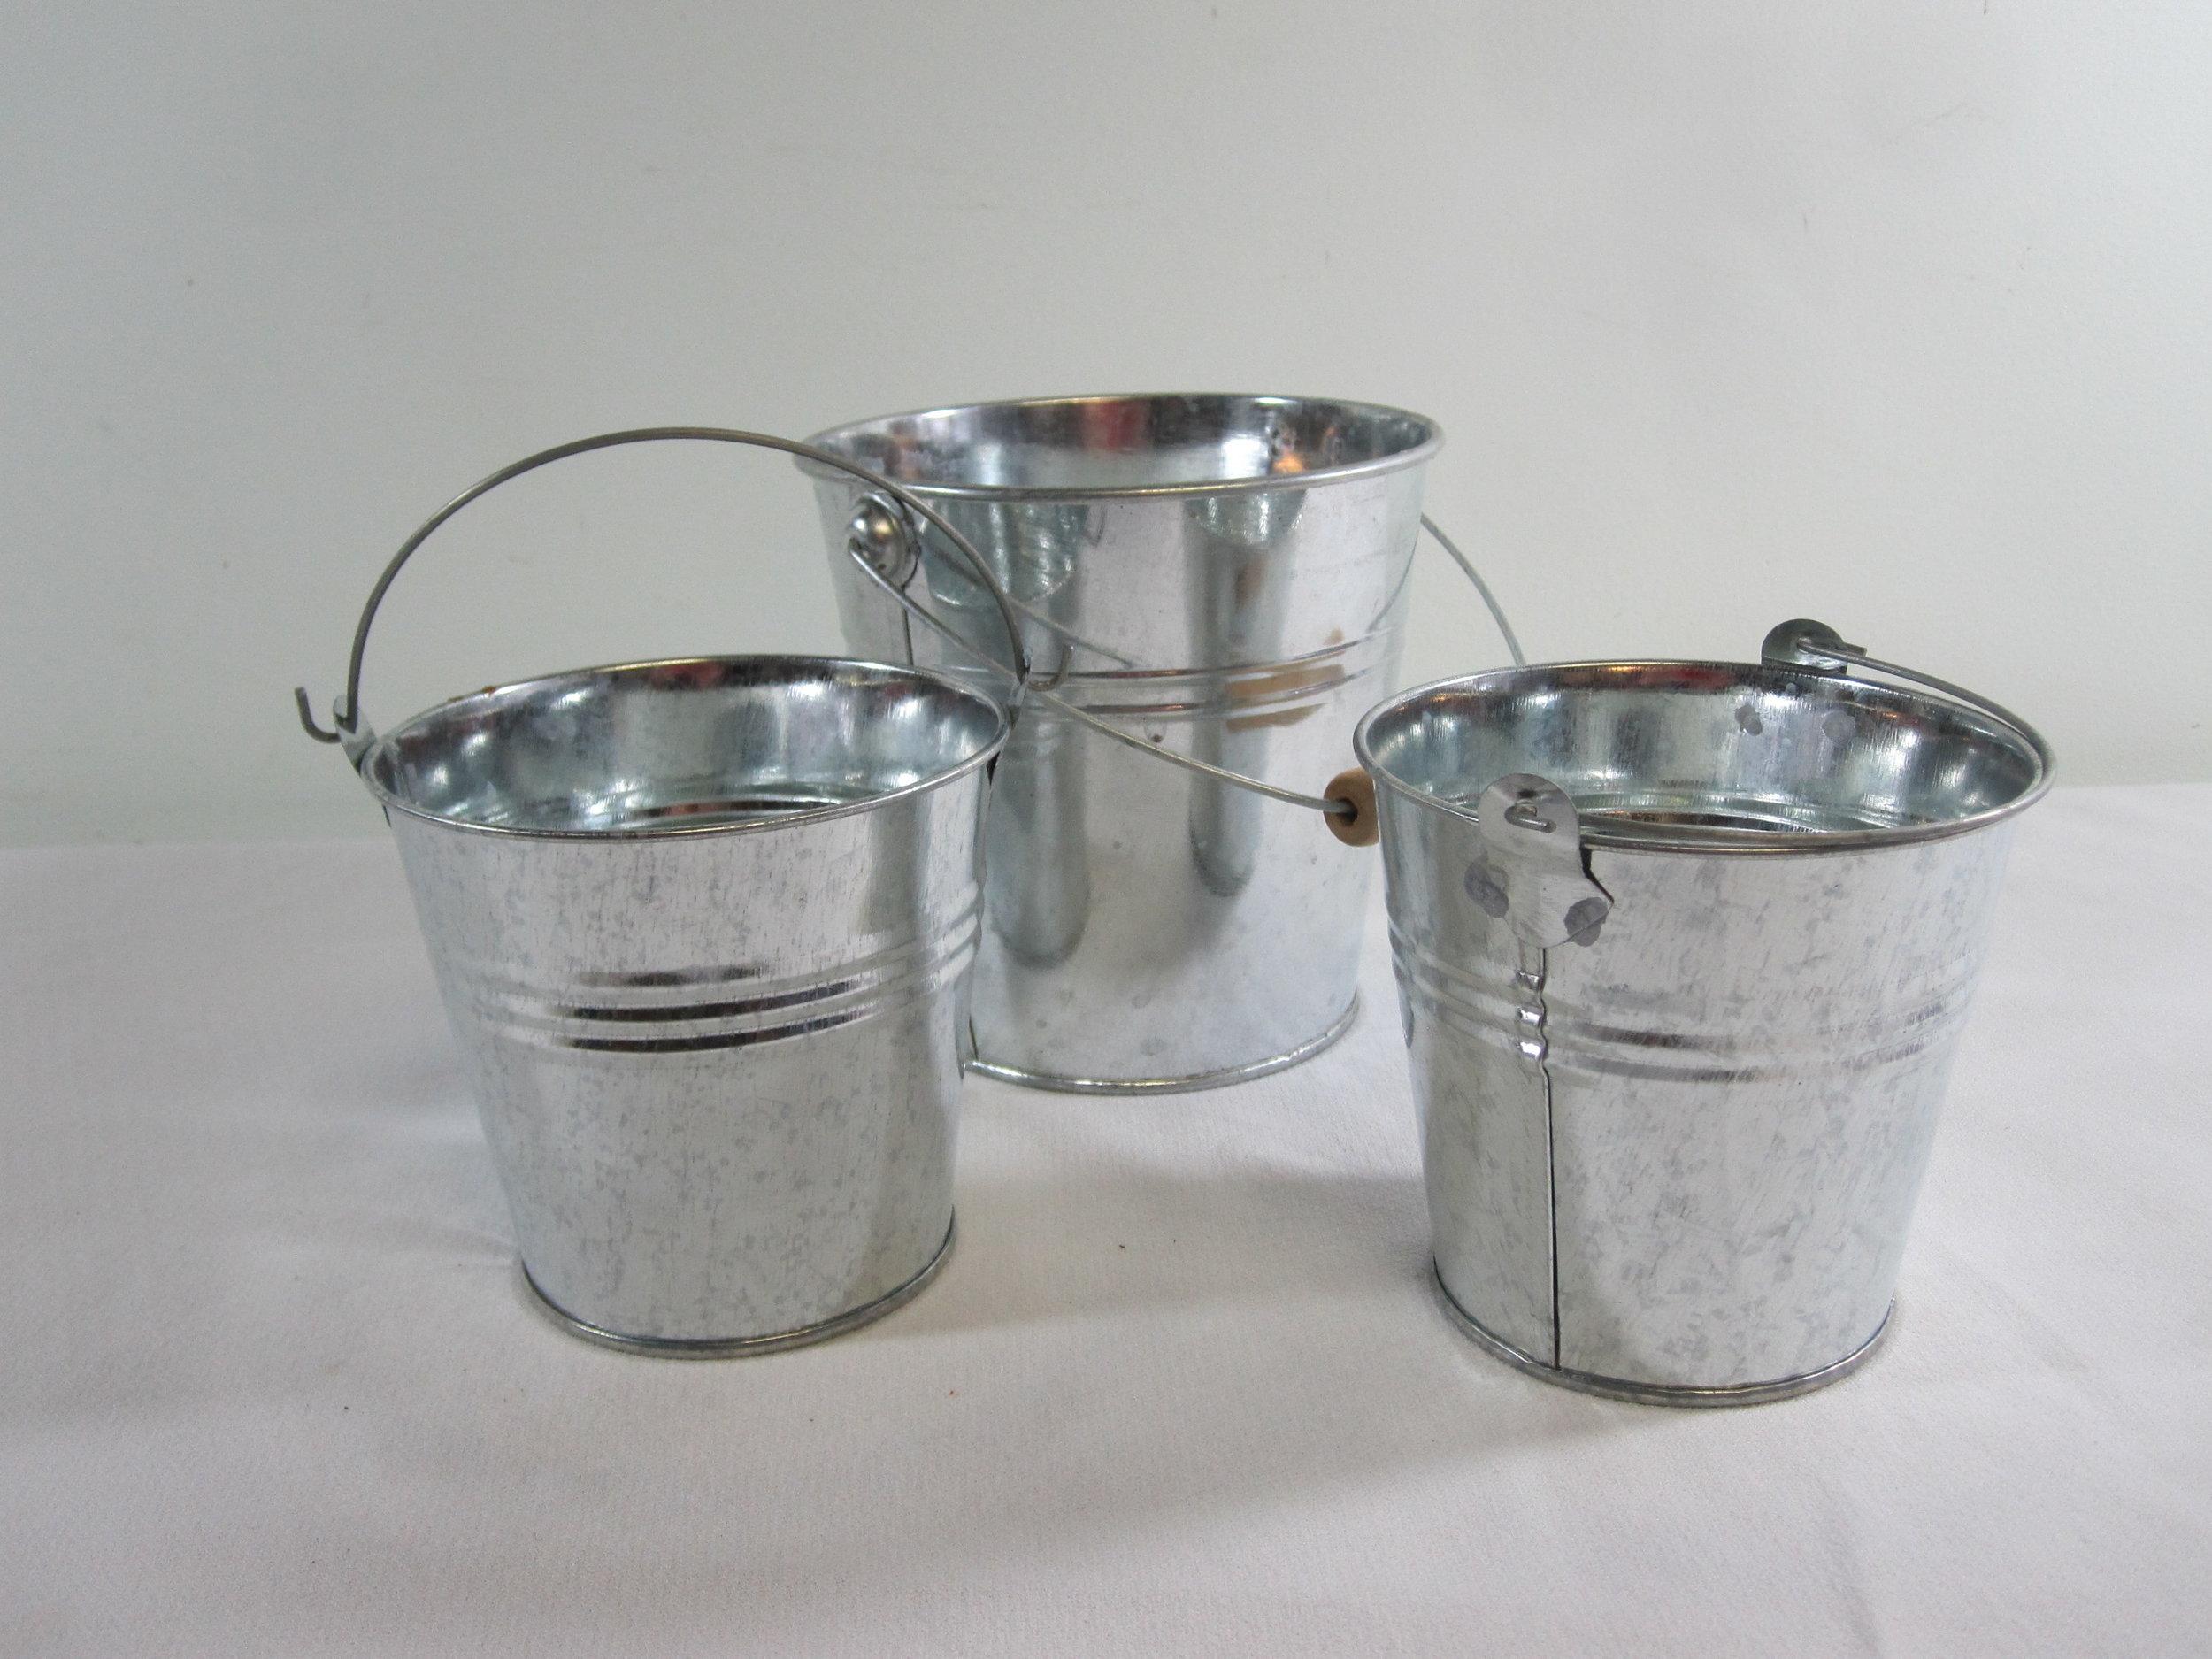 Galvanized Buckets - Description ~ small buckets for favors, candy, etcQuantity ~ 10Price ~ $1